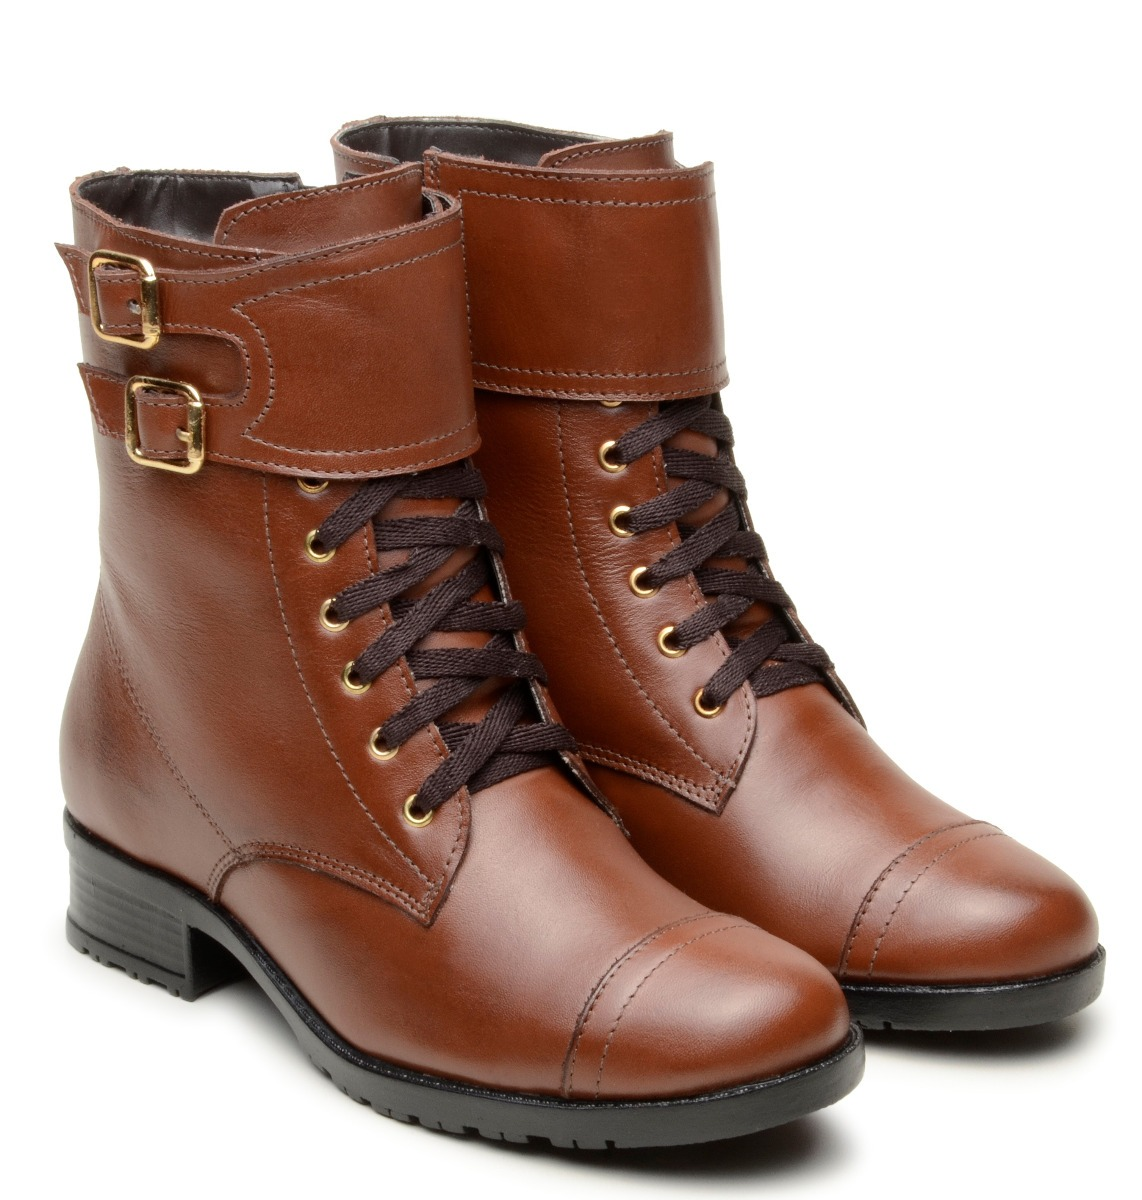 820f6b01c coturno baixo feminino bota couro marrom e preto estiloso. Carregando zoom.